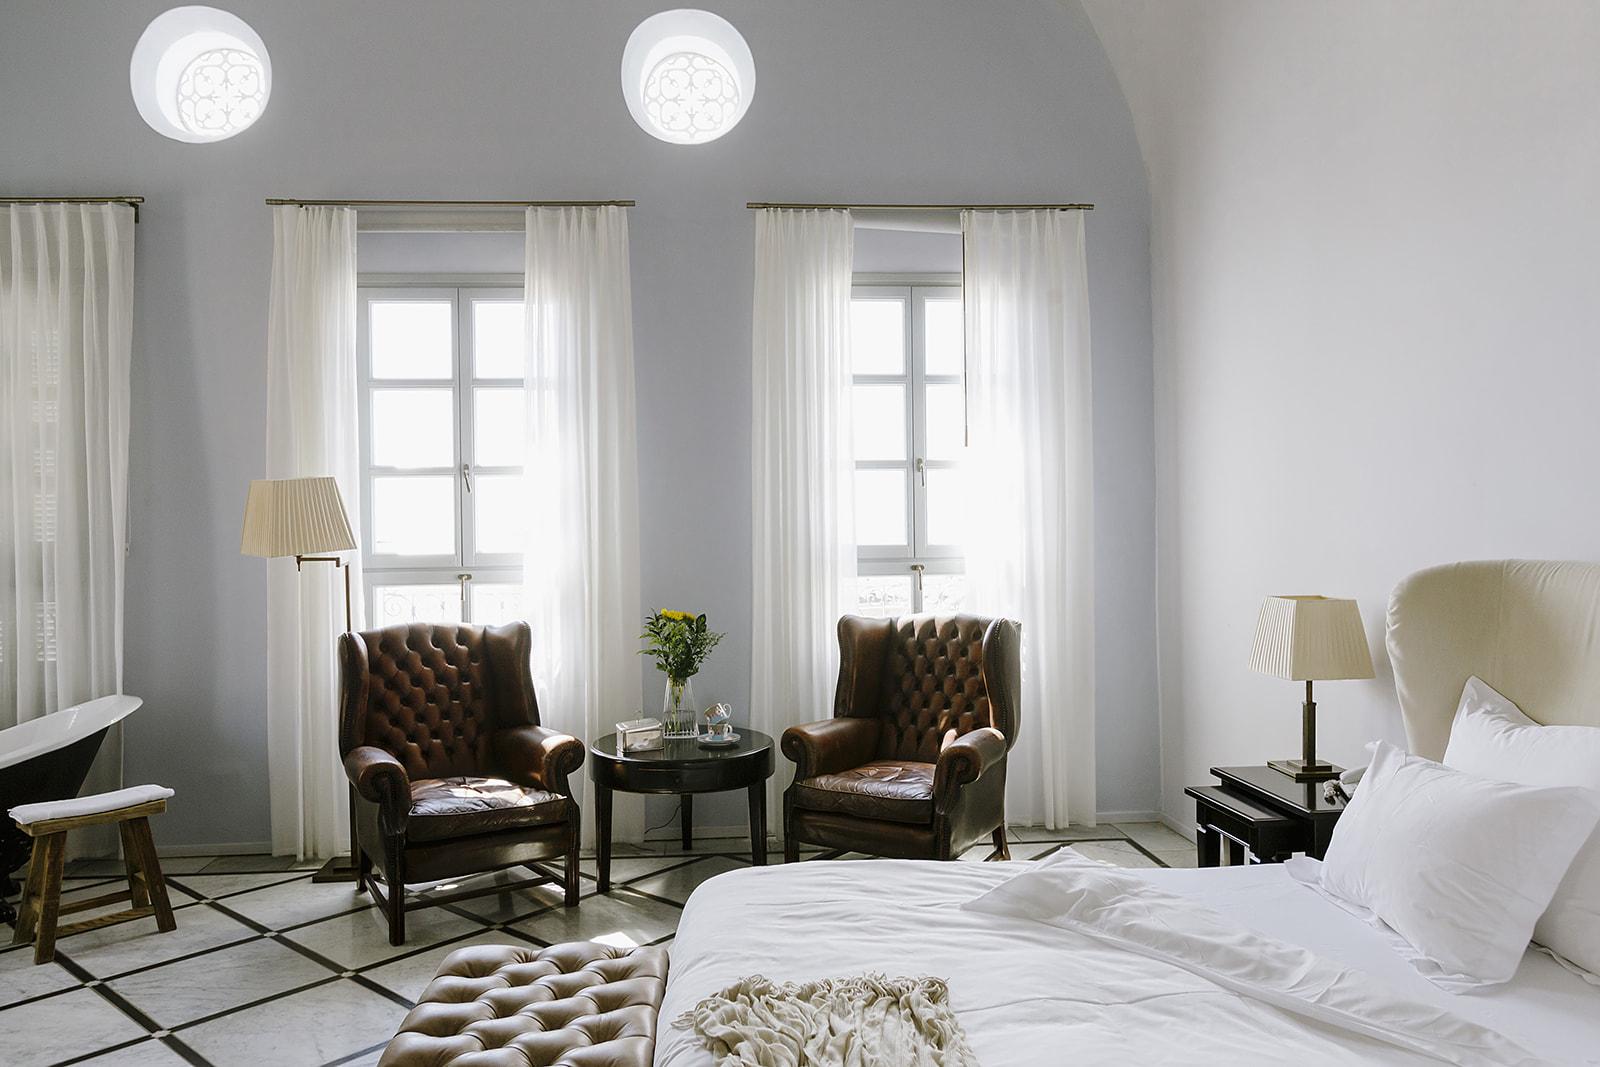 MakeEatMagazine_Travel_Best_Akko_hotels_Efendi_02